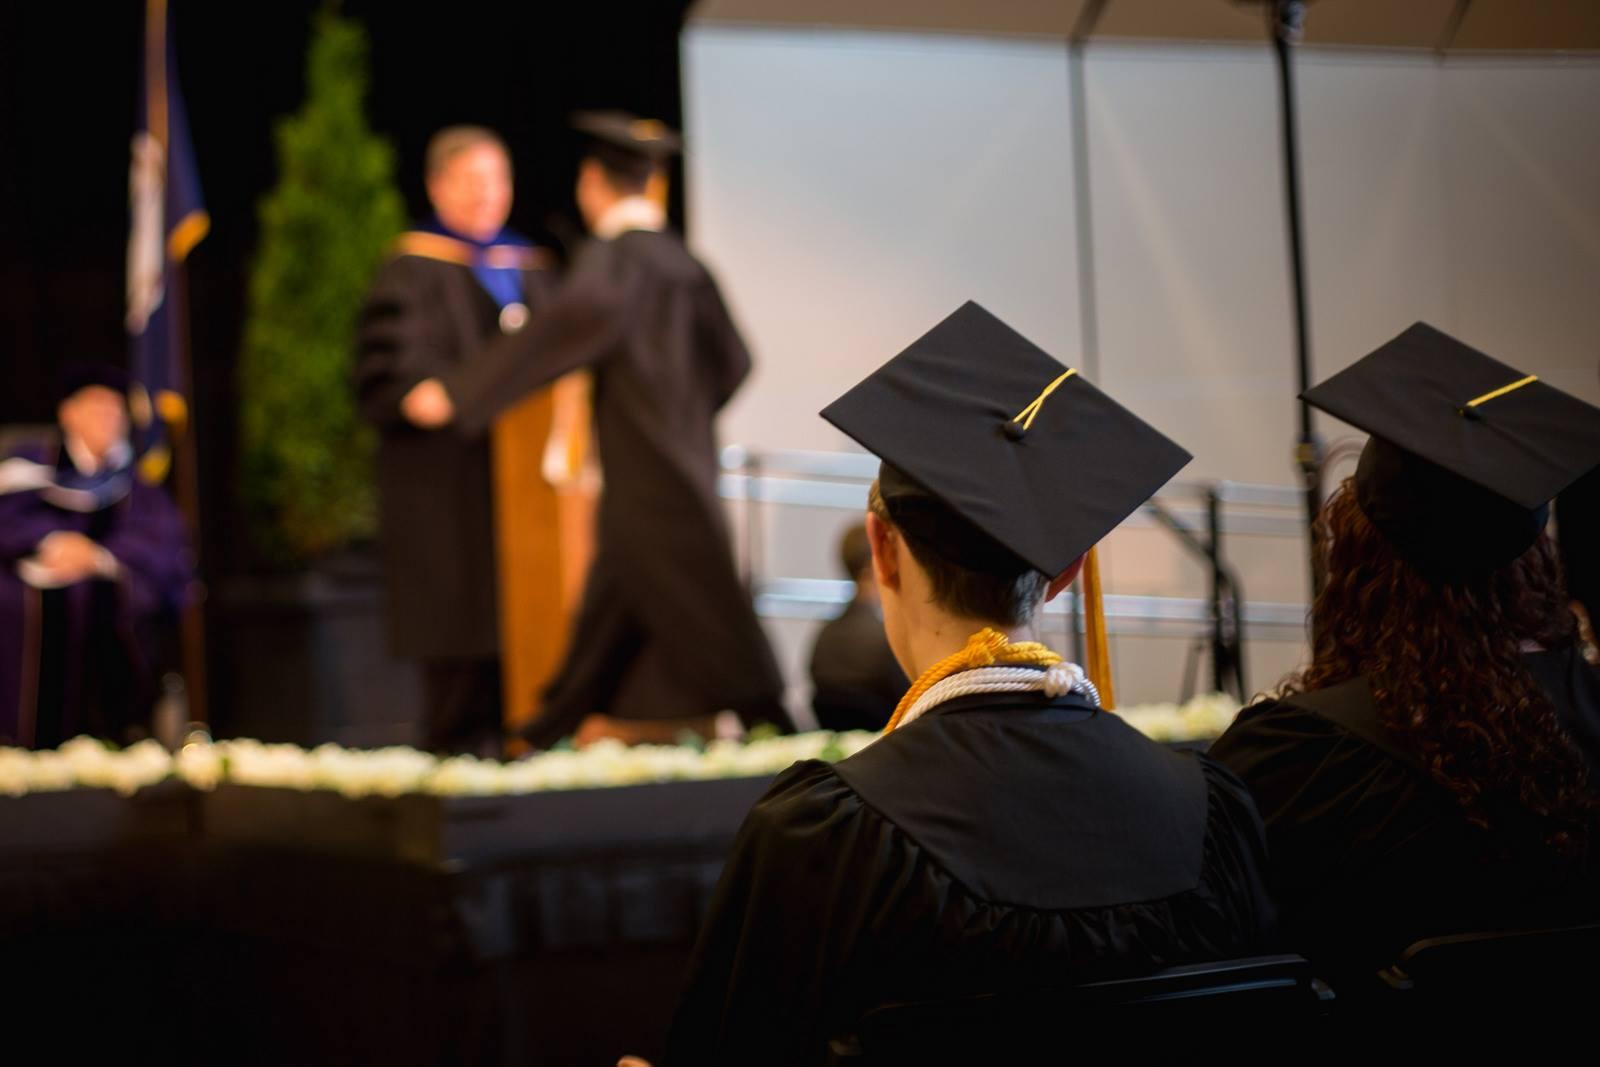 Patrick Henry College graduation ceremony